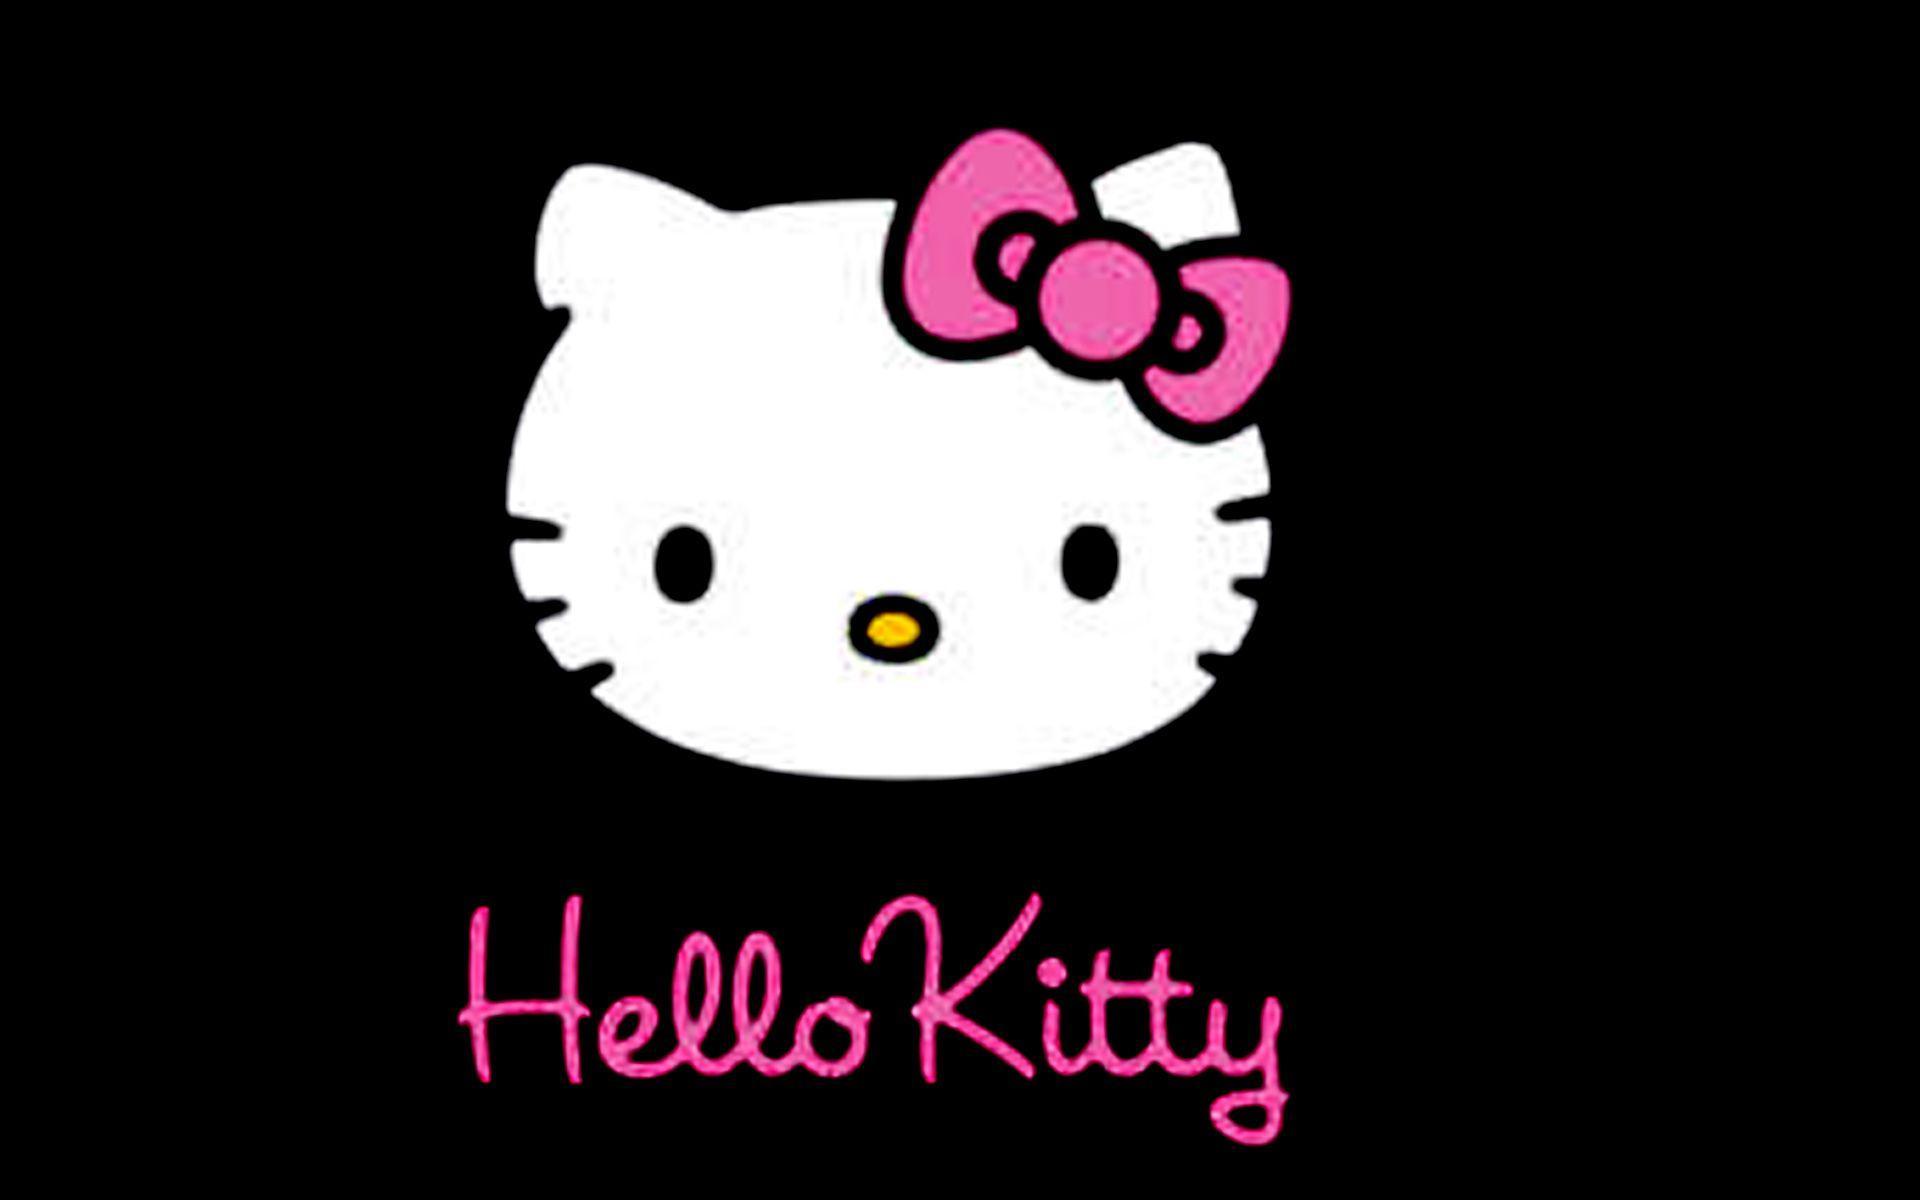 Black Hello Kitty Wallpapers Top Free Black Hello Kitty